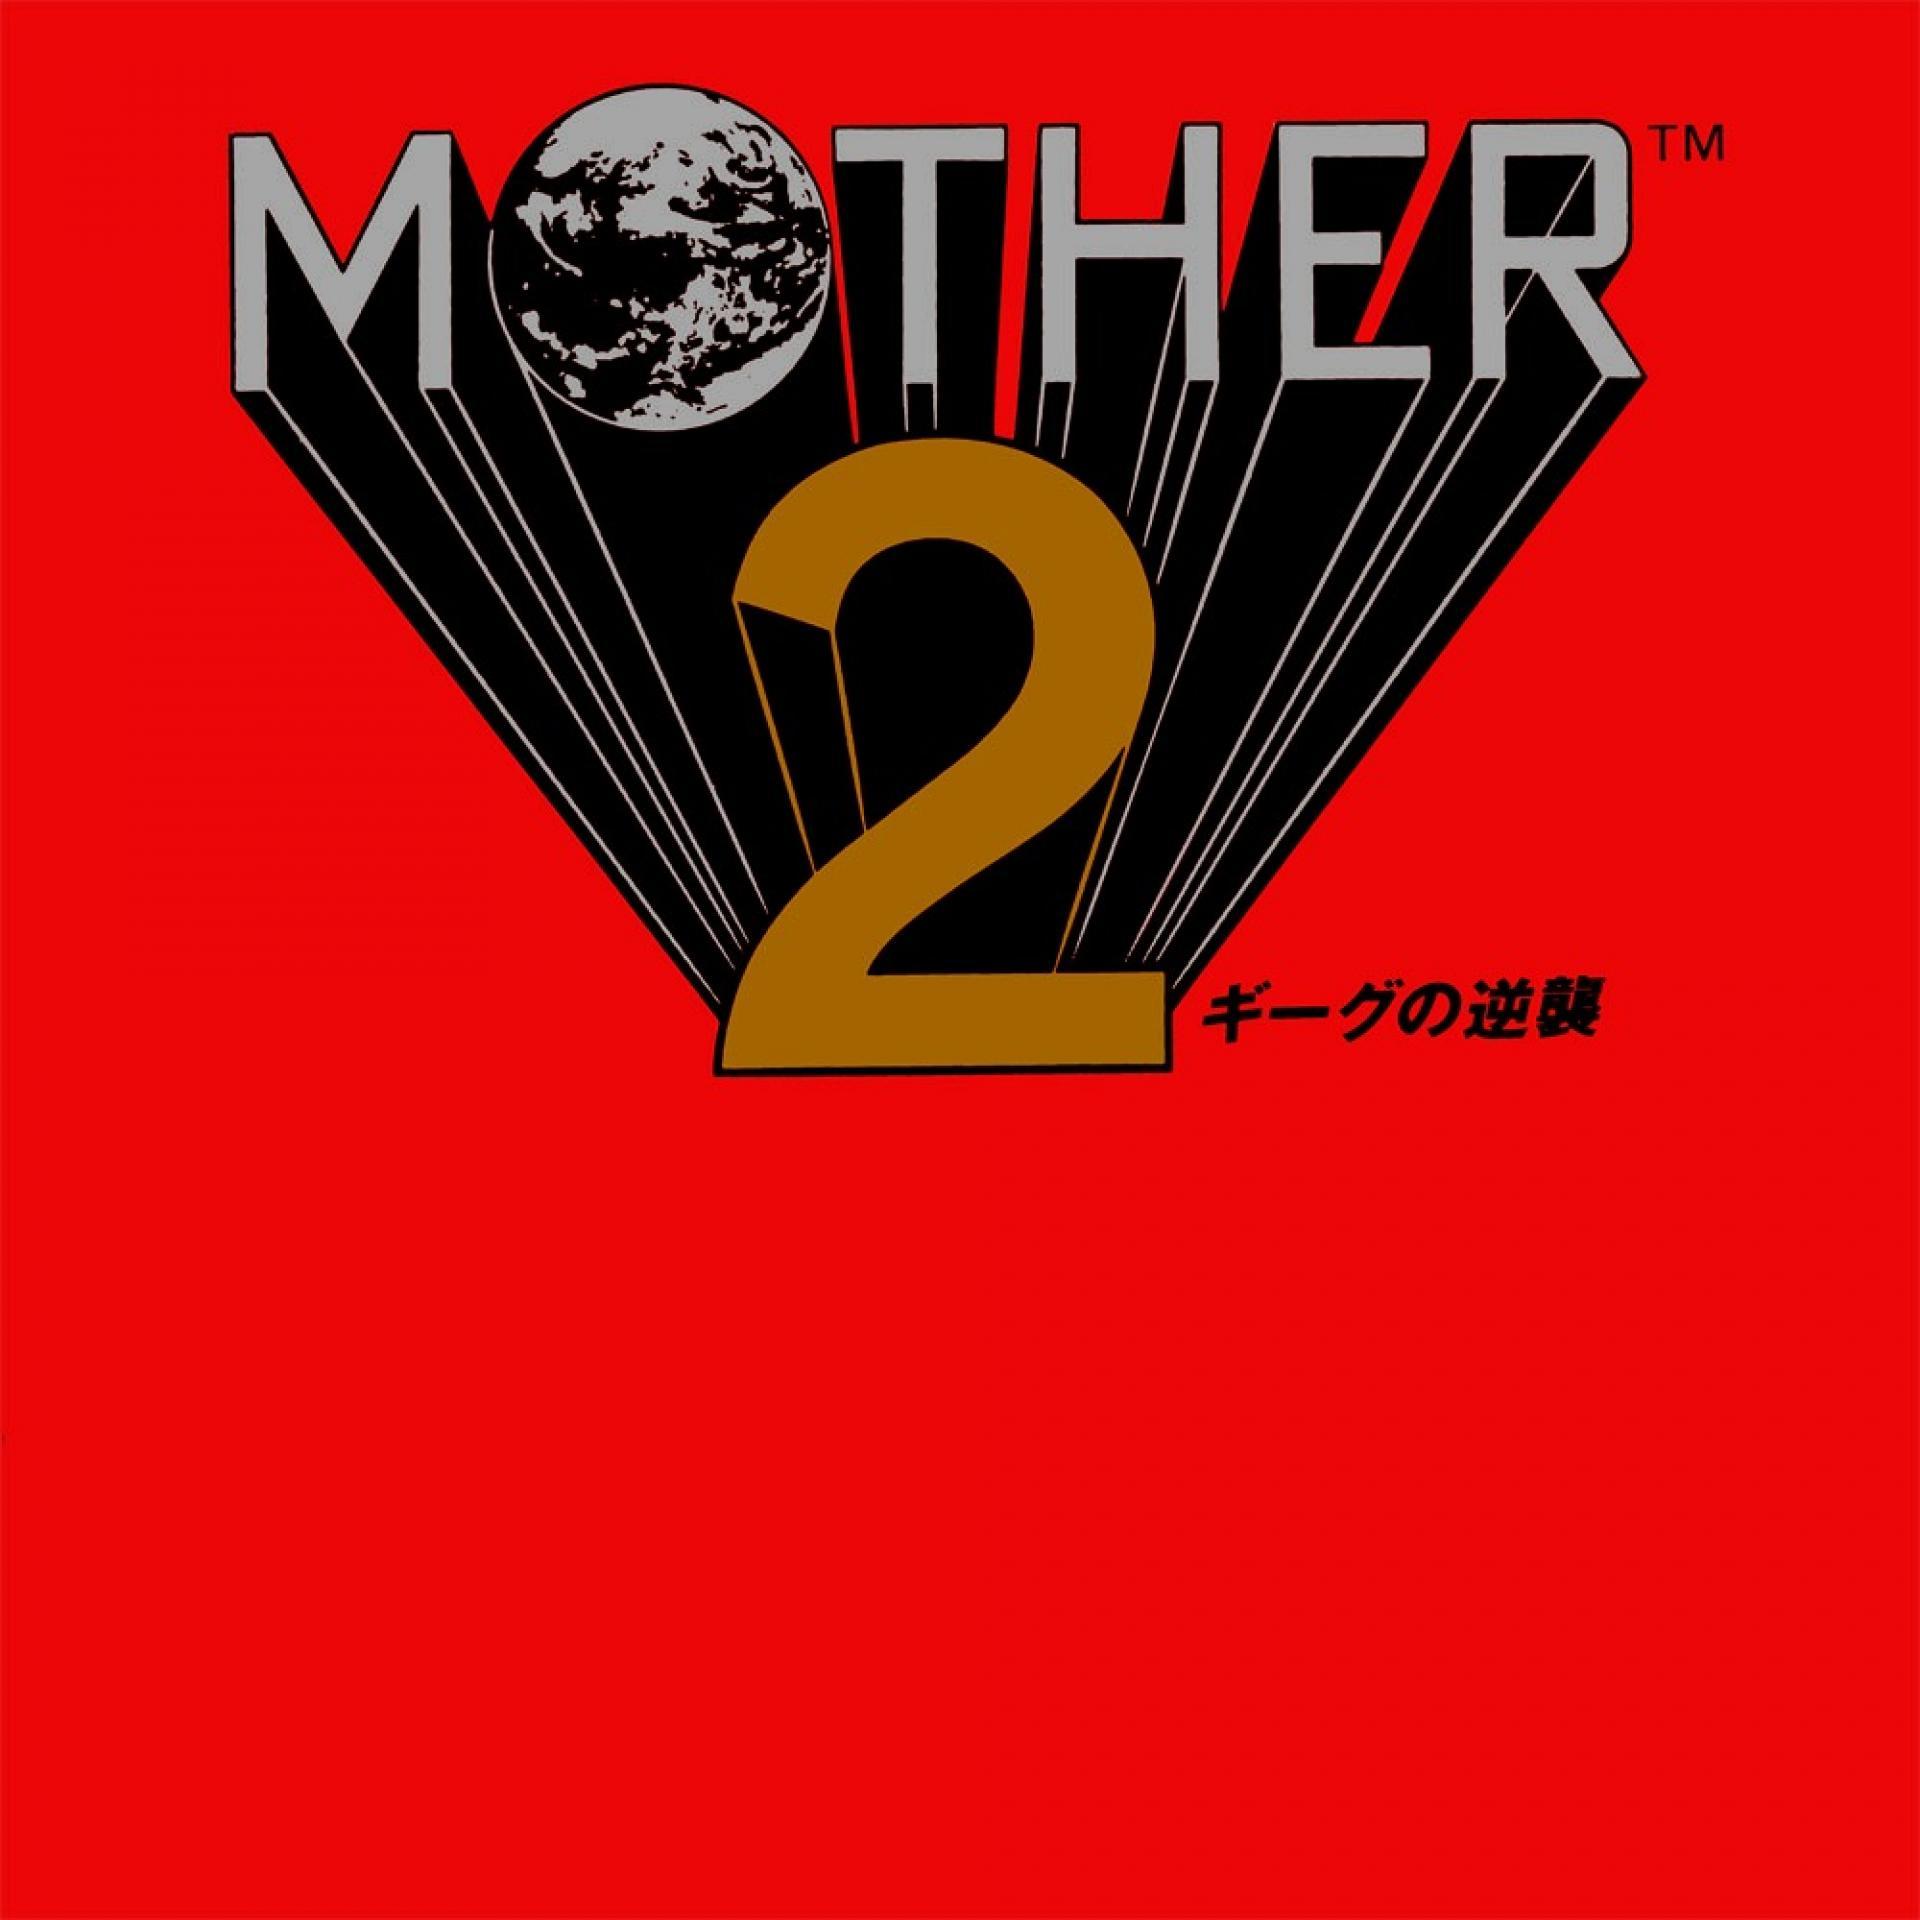 Mother 2 Earthbound Vinyl Releasing Stateside In Q4 2017